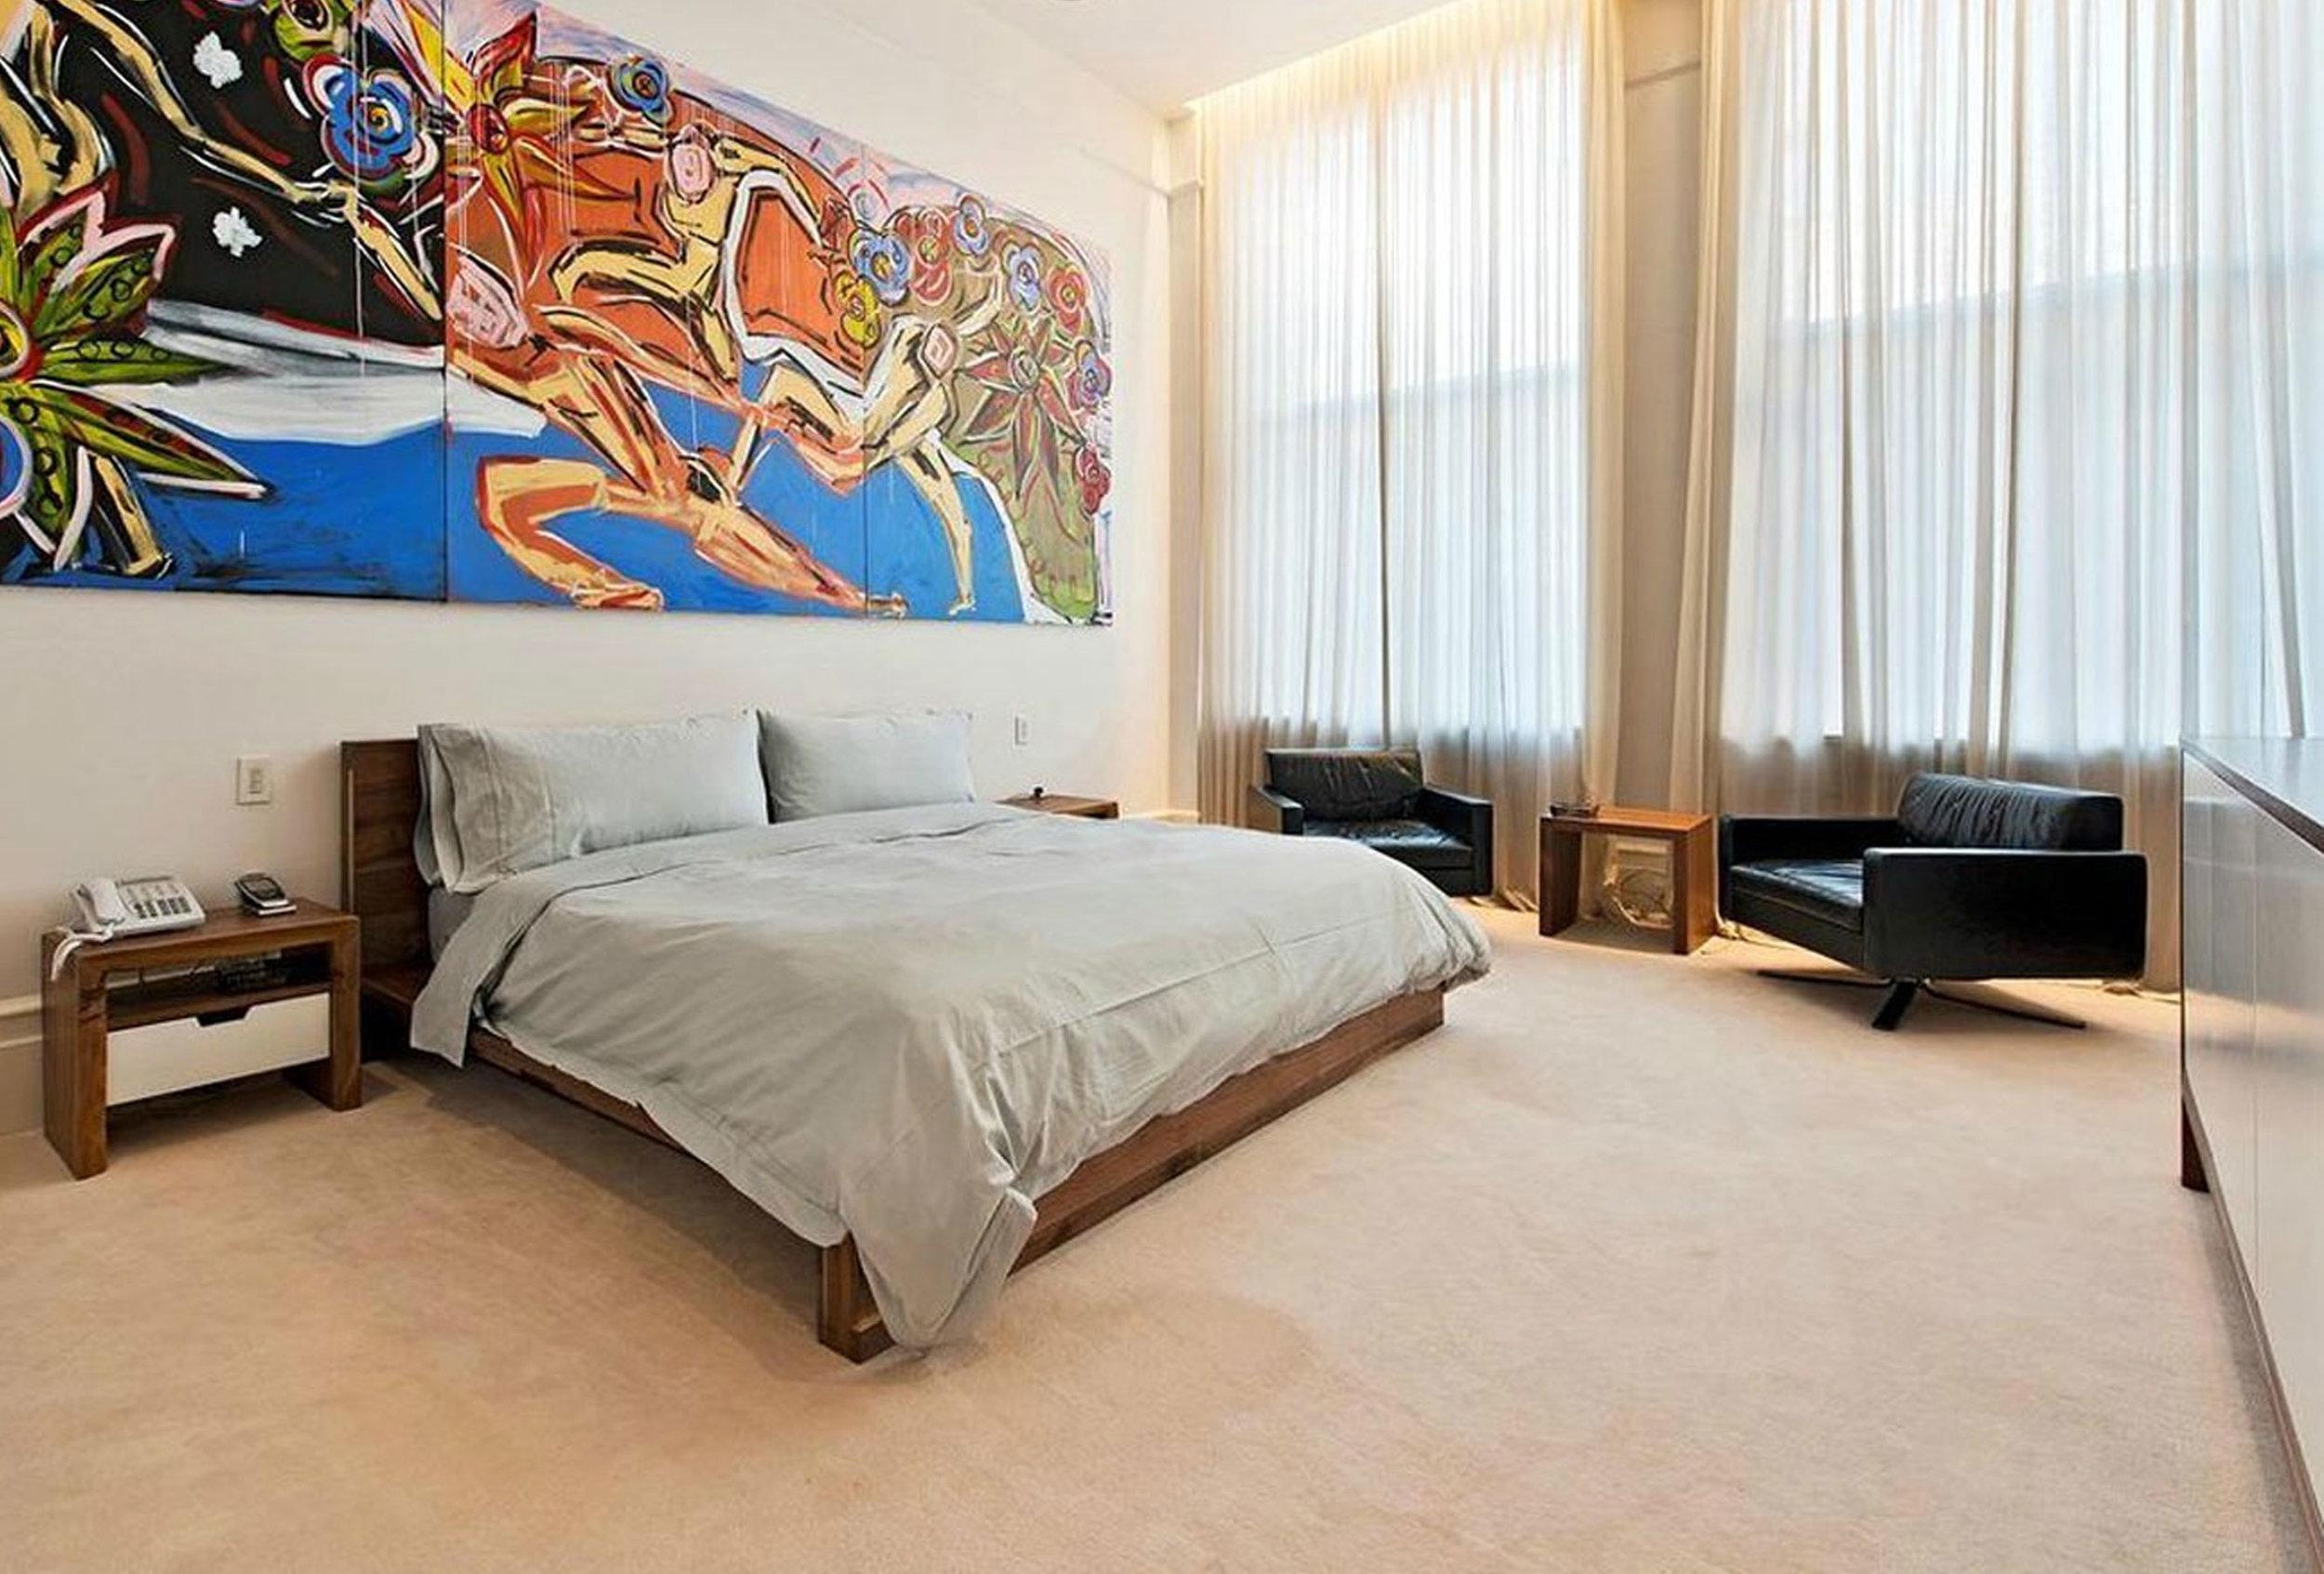 SHIMNA Liffey Bed